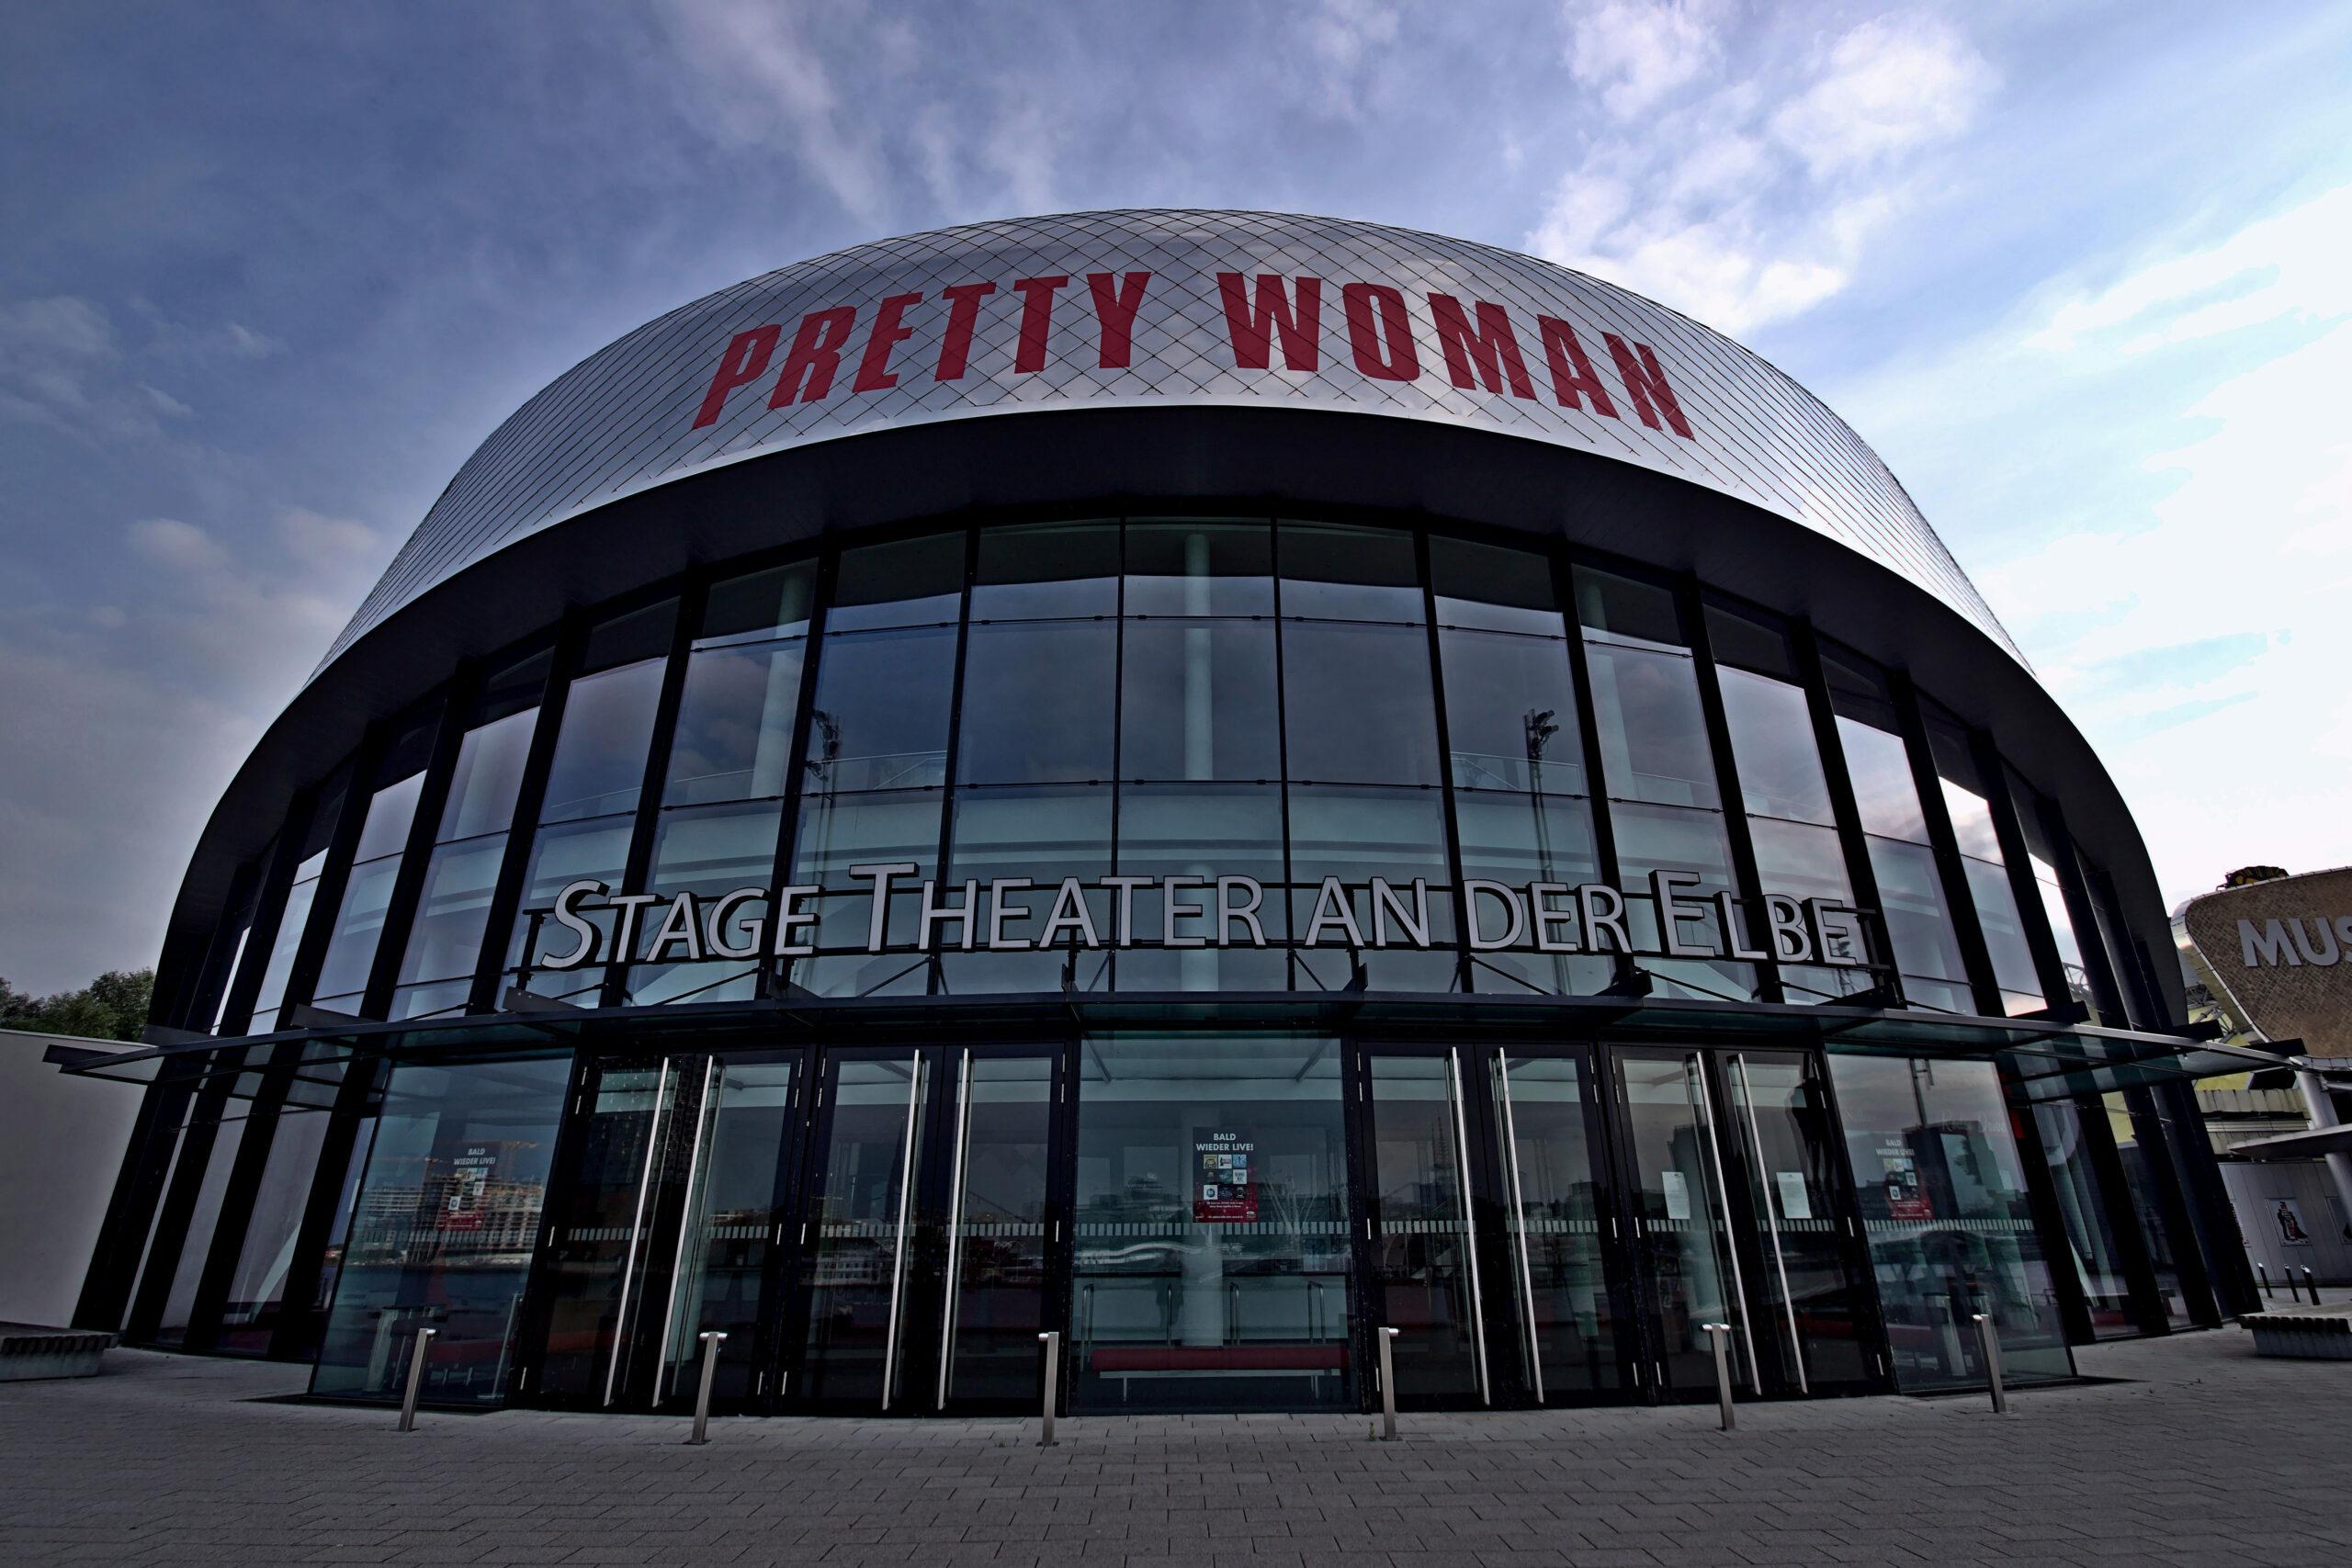 Hans Stötera - Feierabendtour 24.06.2021 - Pretty Woman